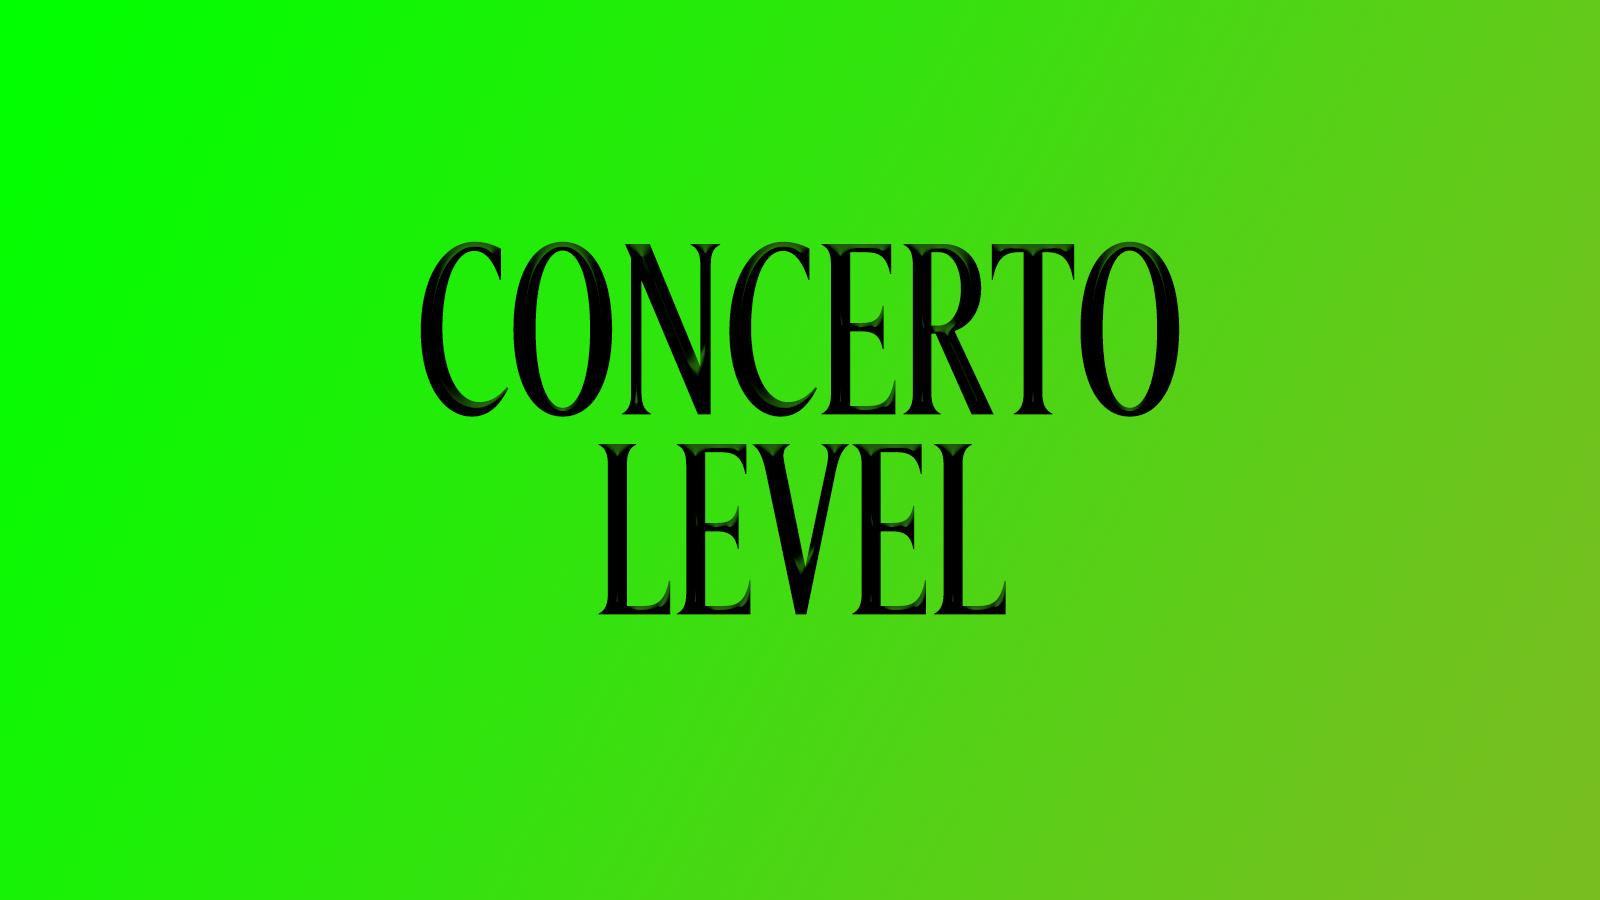 CONCERTO LEVEL